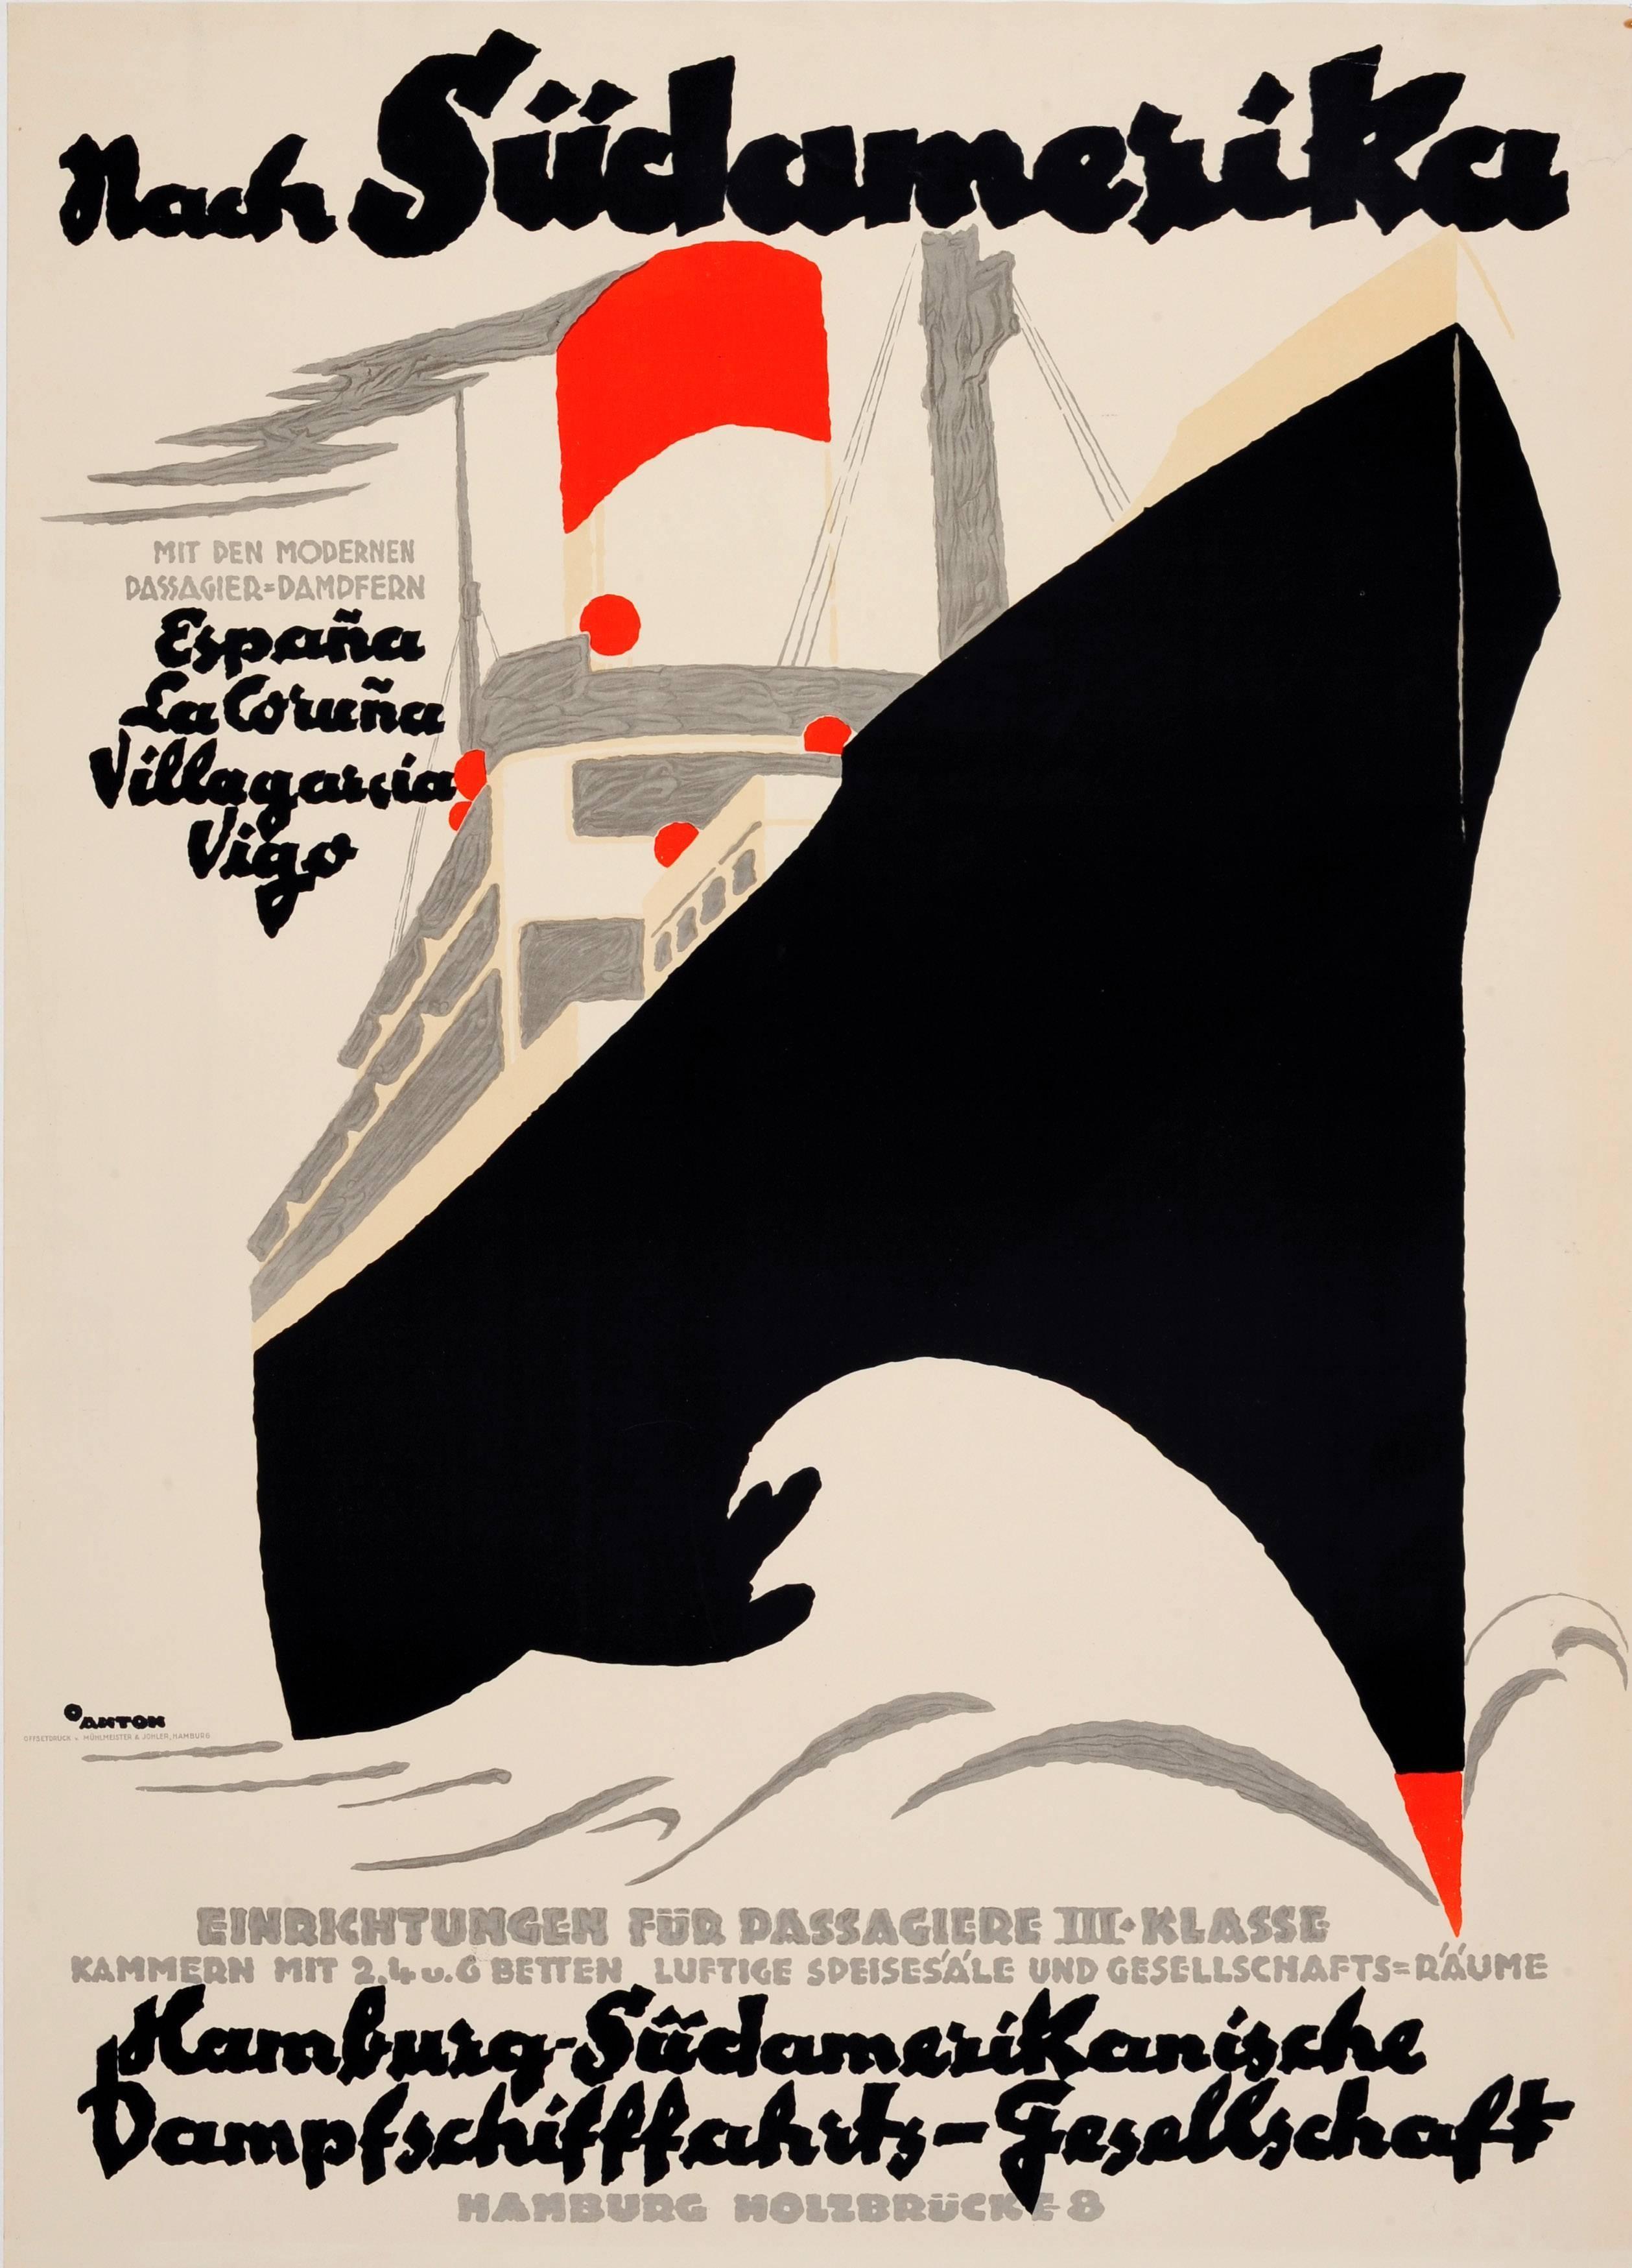 Original Vintage Hamburg America Line Cruise Ship Travel Poster To South America